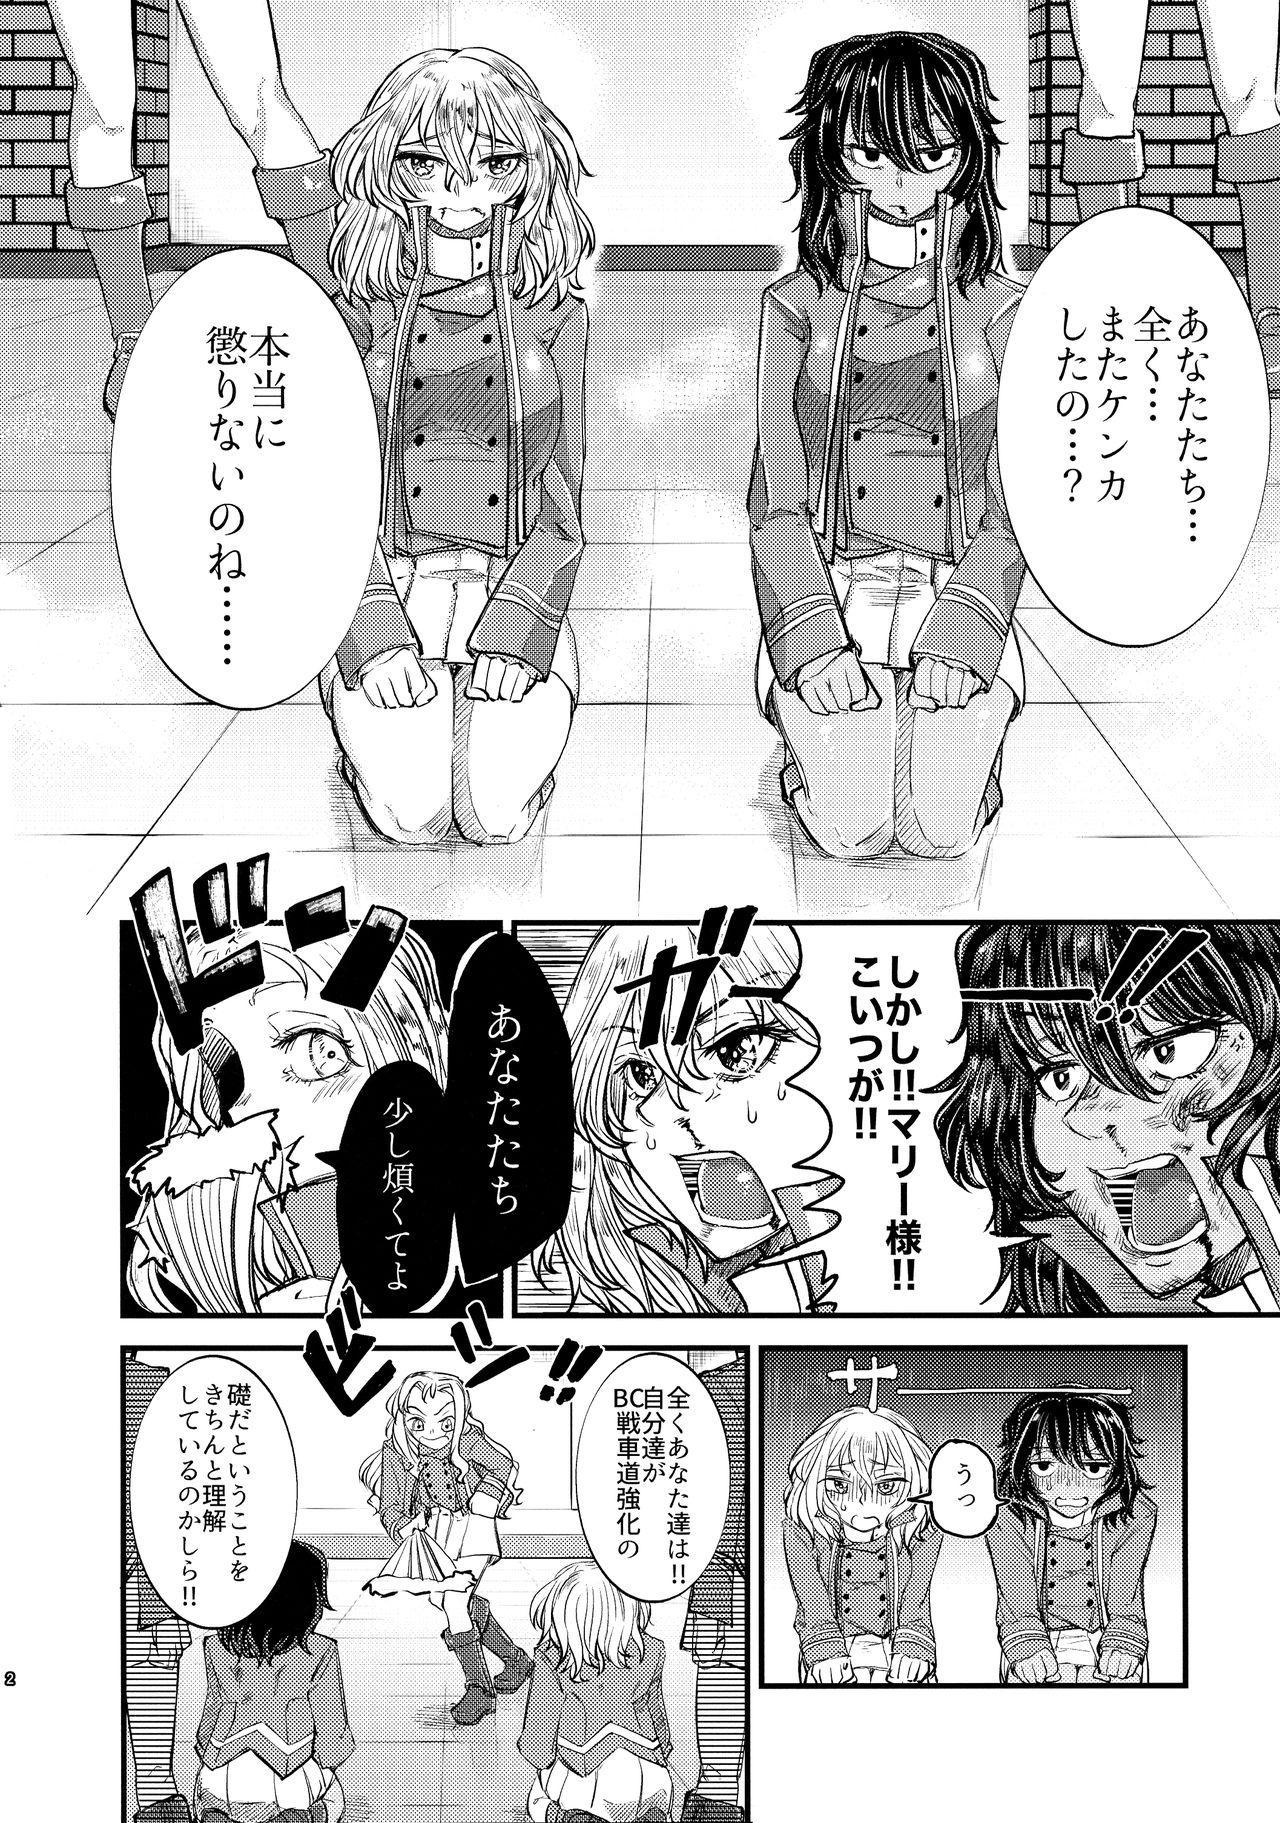 Kimi o Aishitai. 3